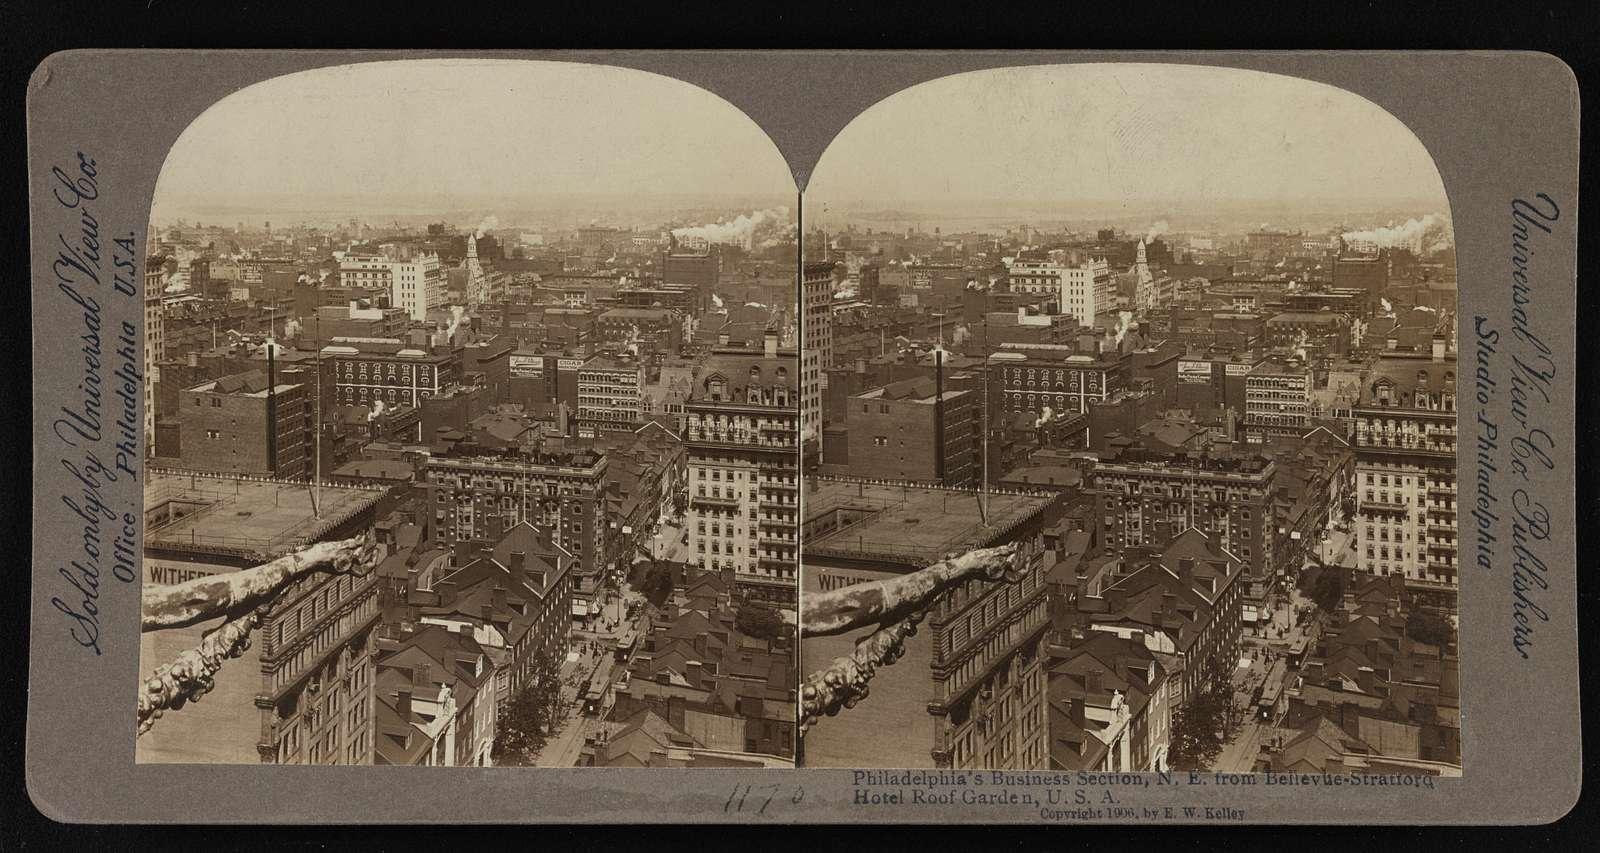 Philadelphia's business section, N.E. from Bellevue-Stratford Hotel Roof Garden